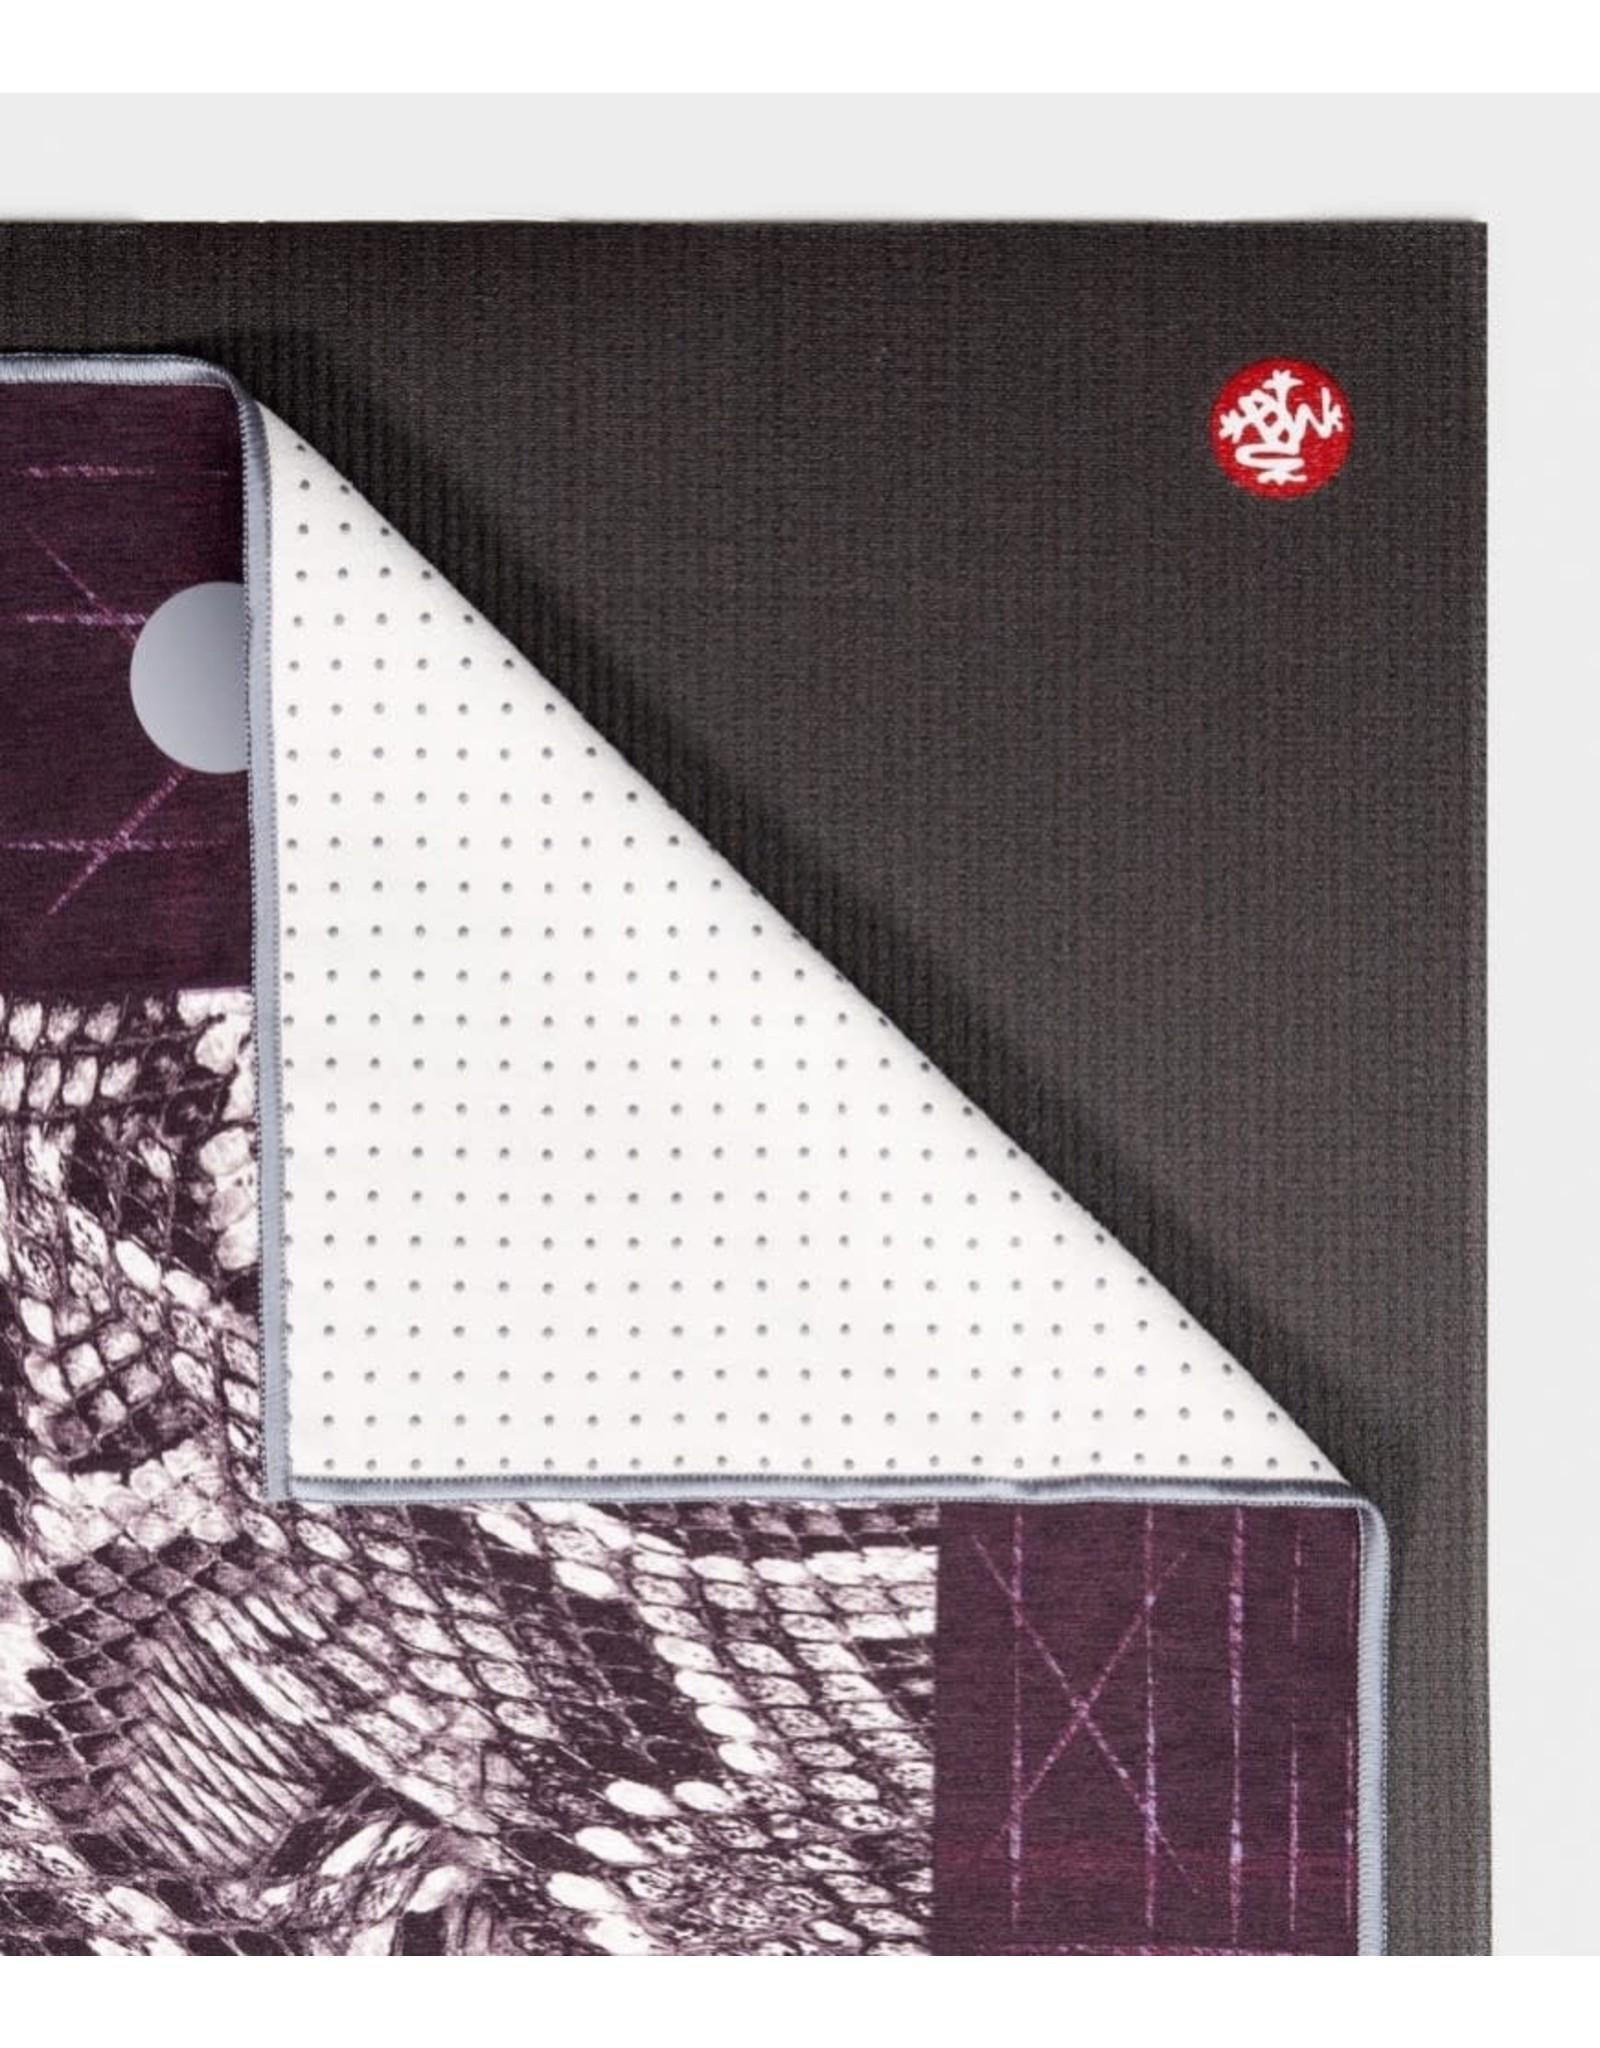 Manduka Yogitoes towel-Sidewinder